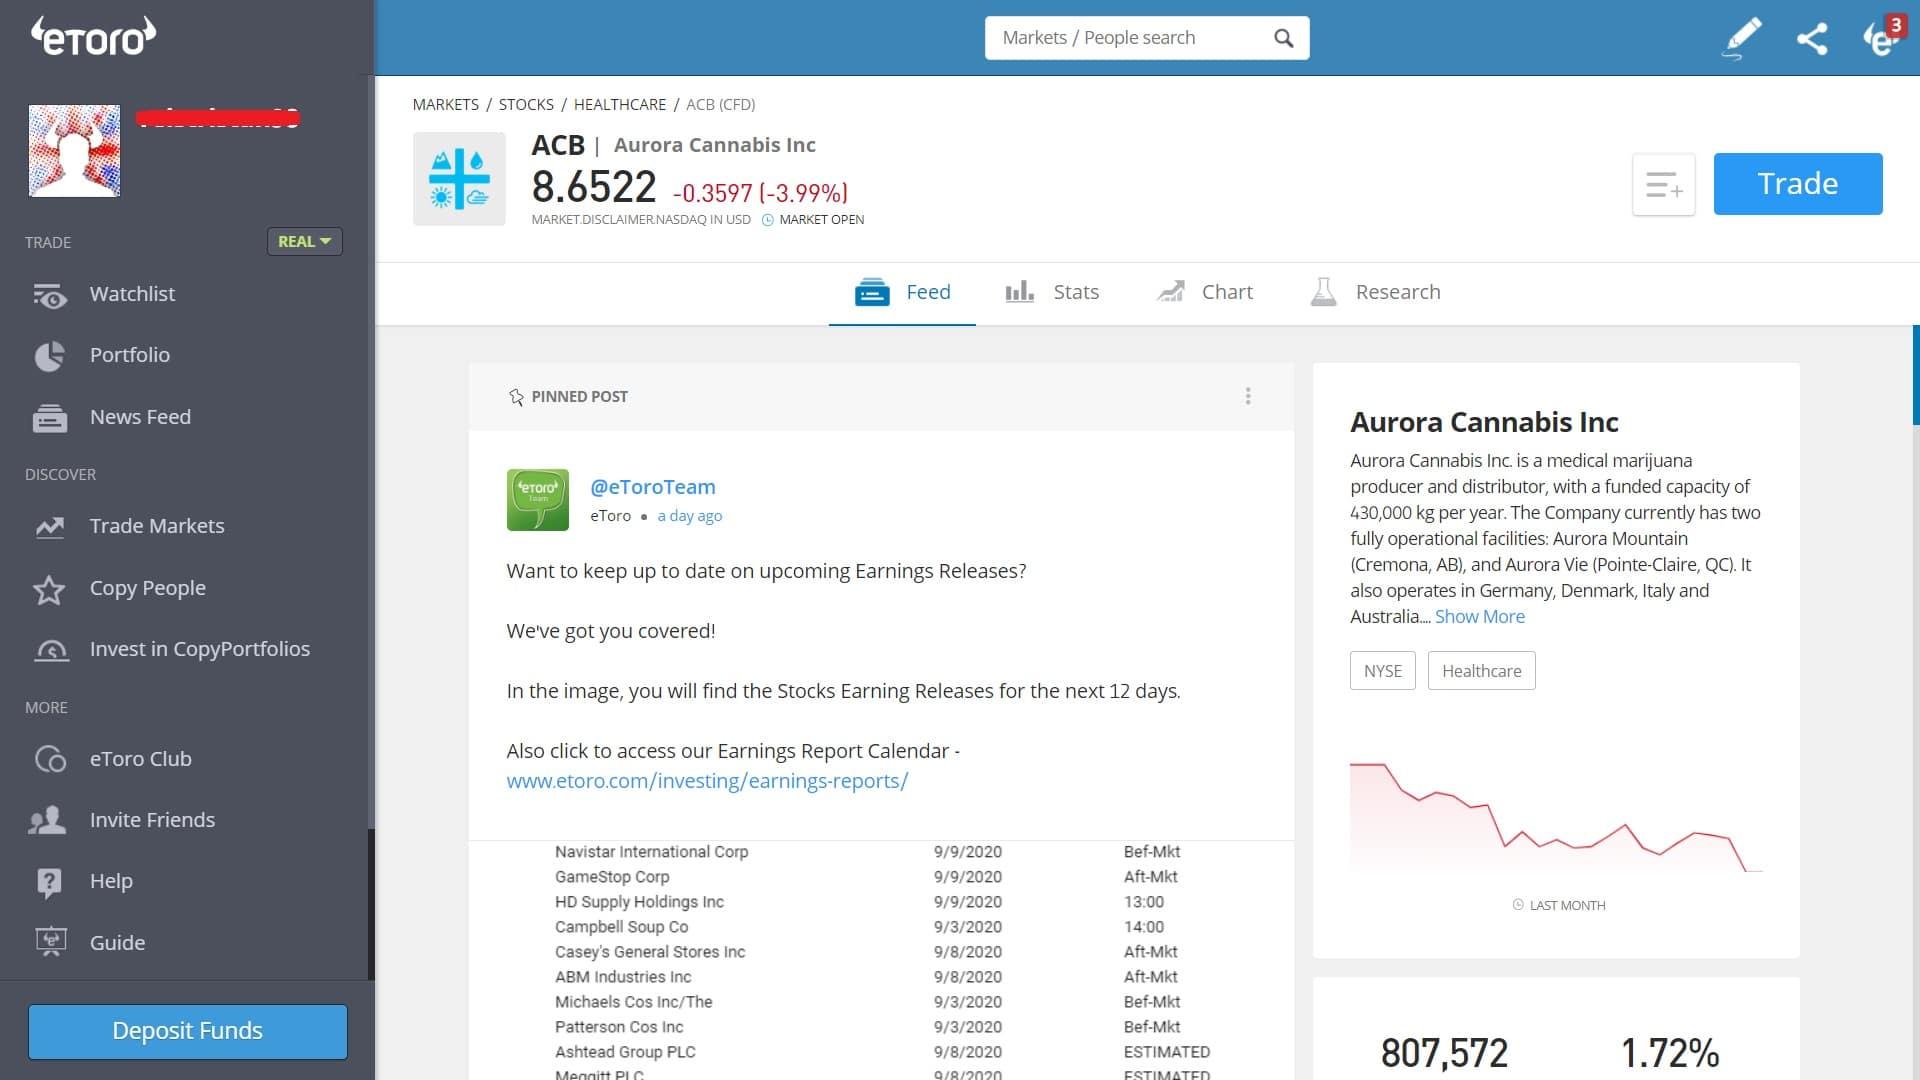 Aurora Cannabis stock trading on eToro's platform